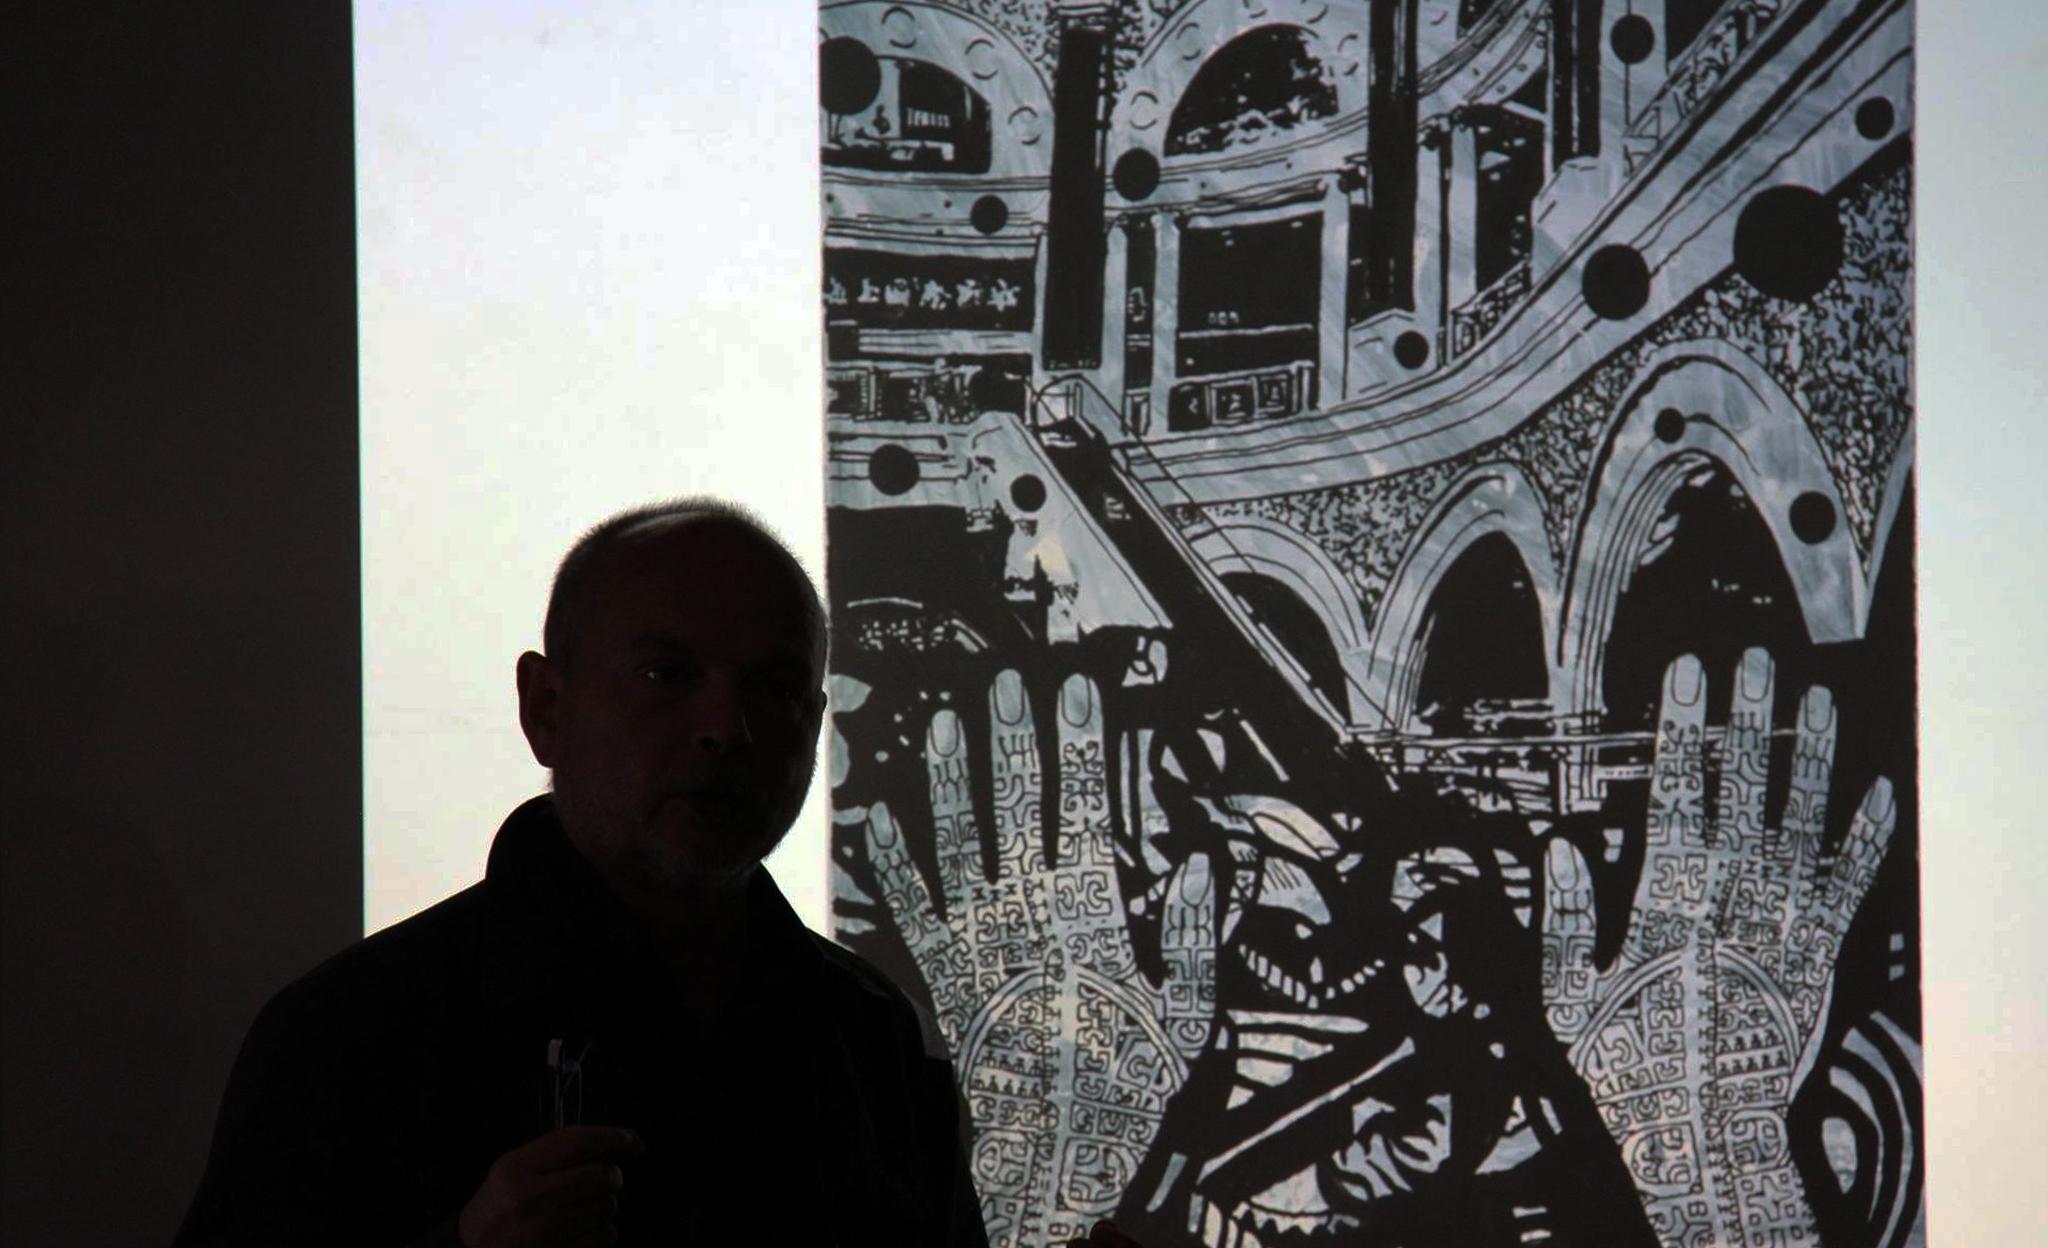 Henning Eichinger and his painting. Photo: Ceri Hann